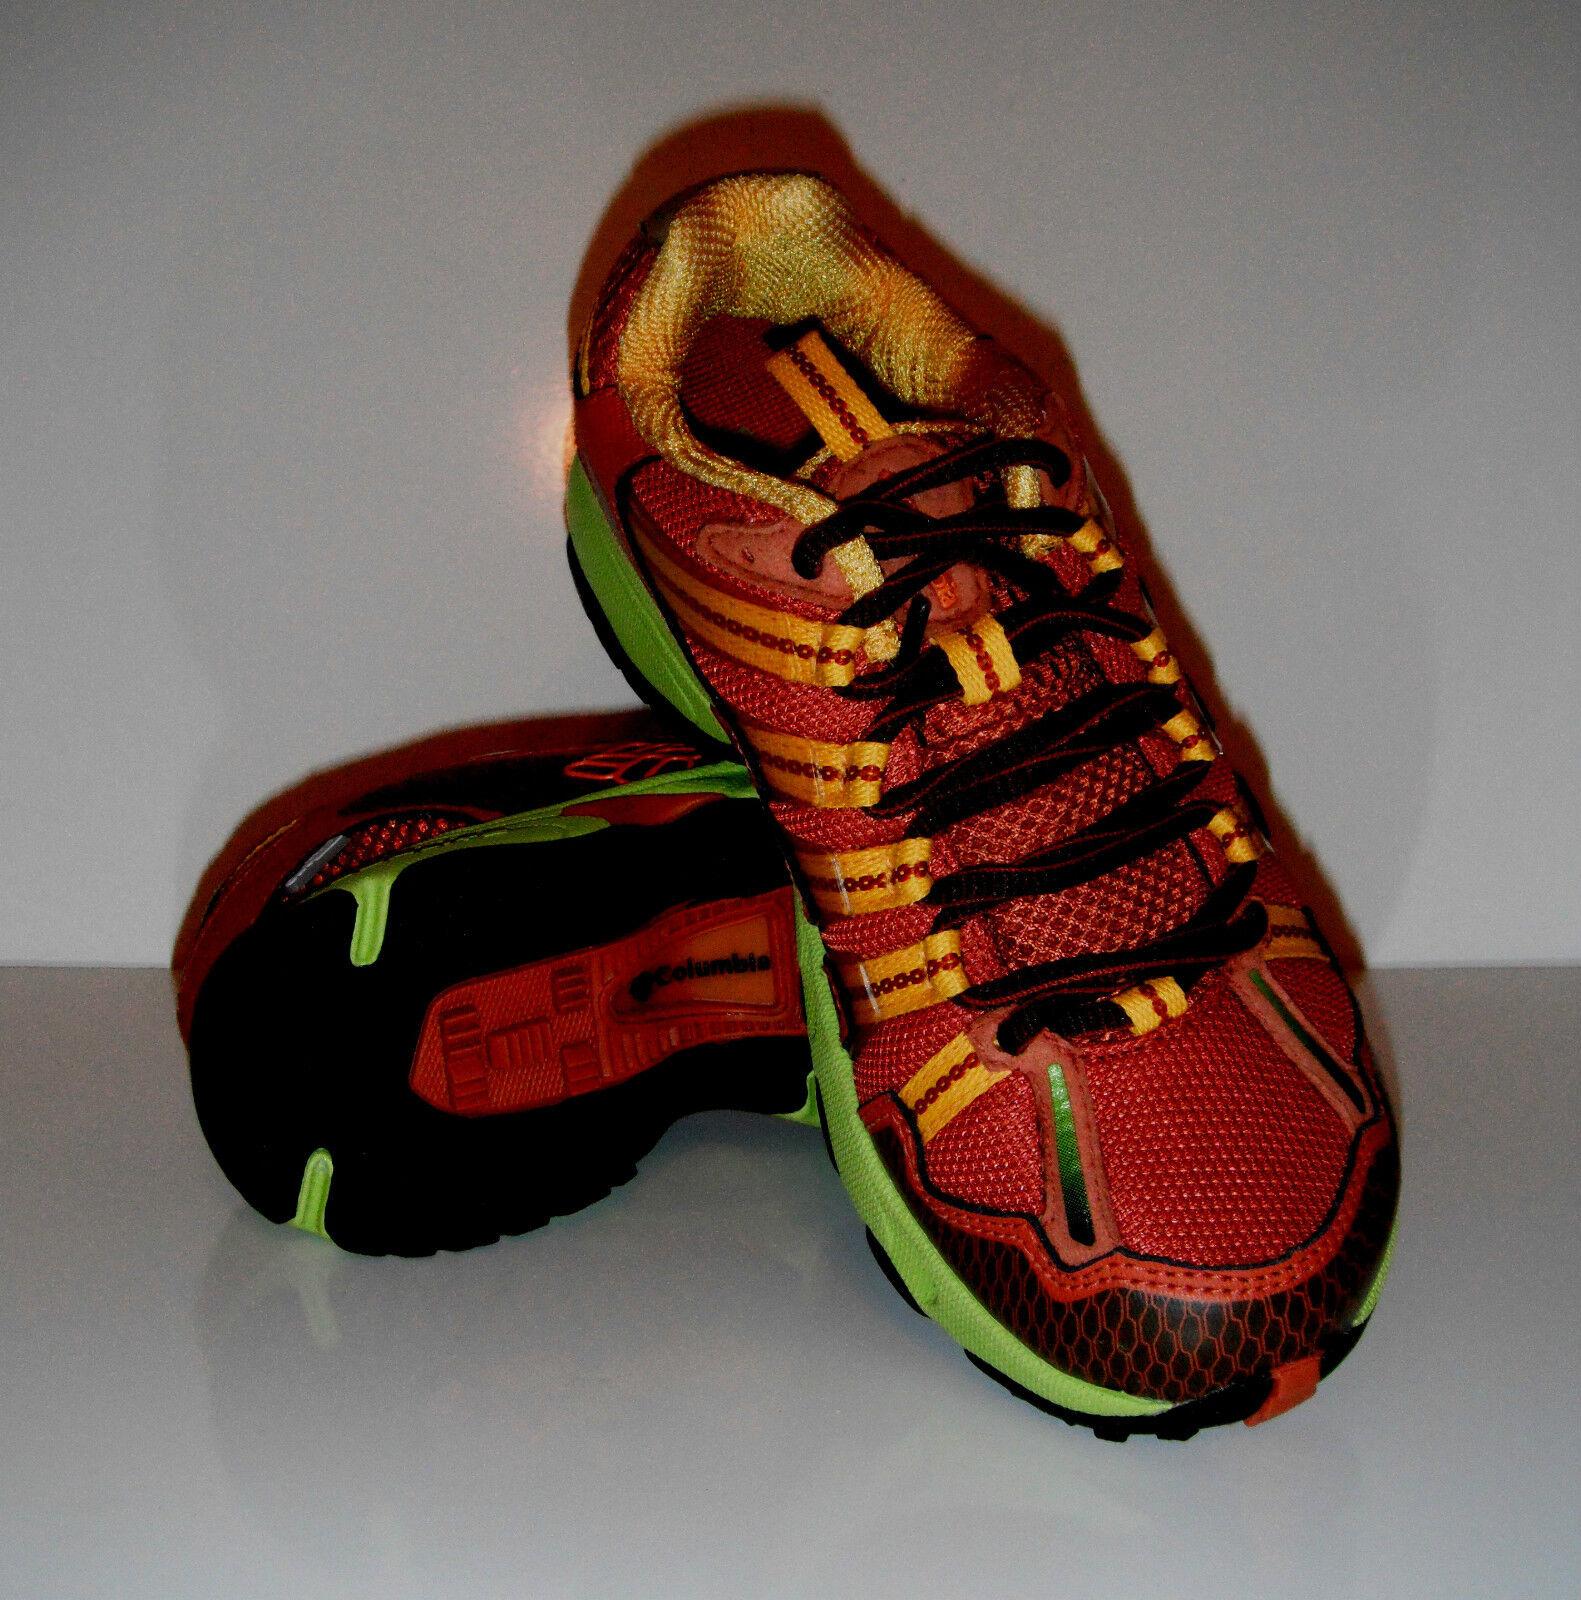 New Columbia WMN Talus Ridge OutDry Waterproof Trail Running Sneakers sz 5